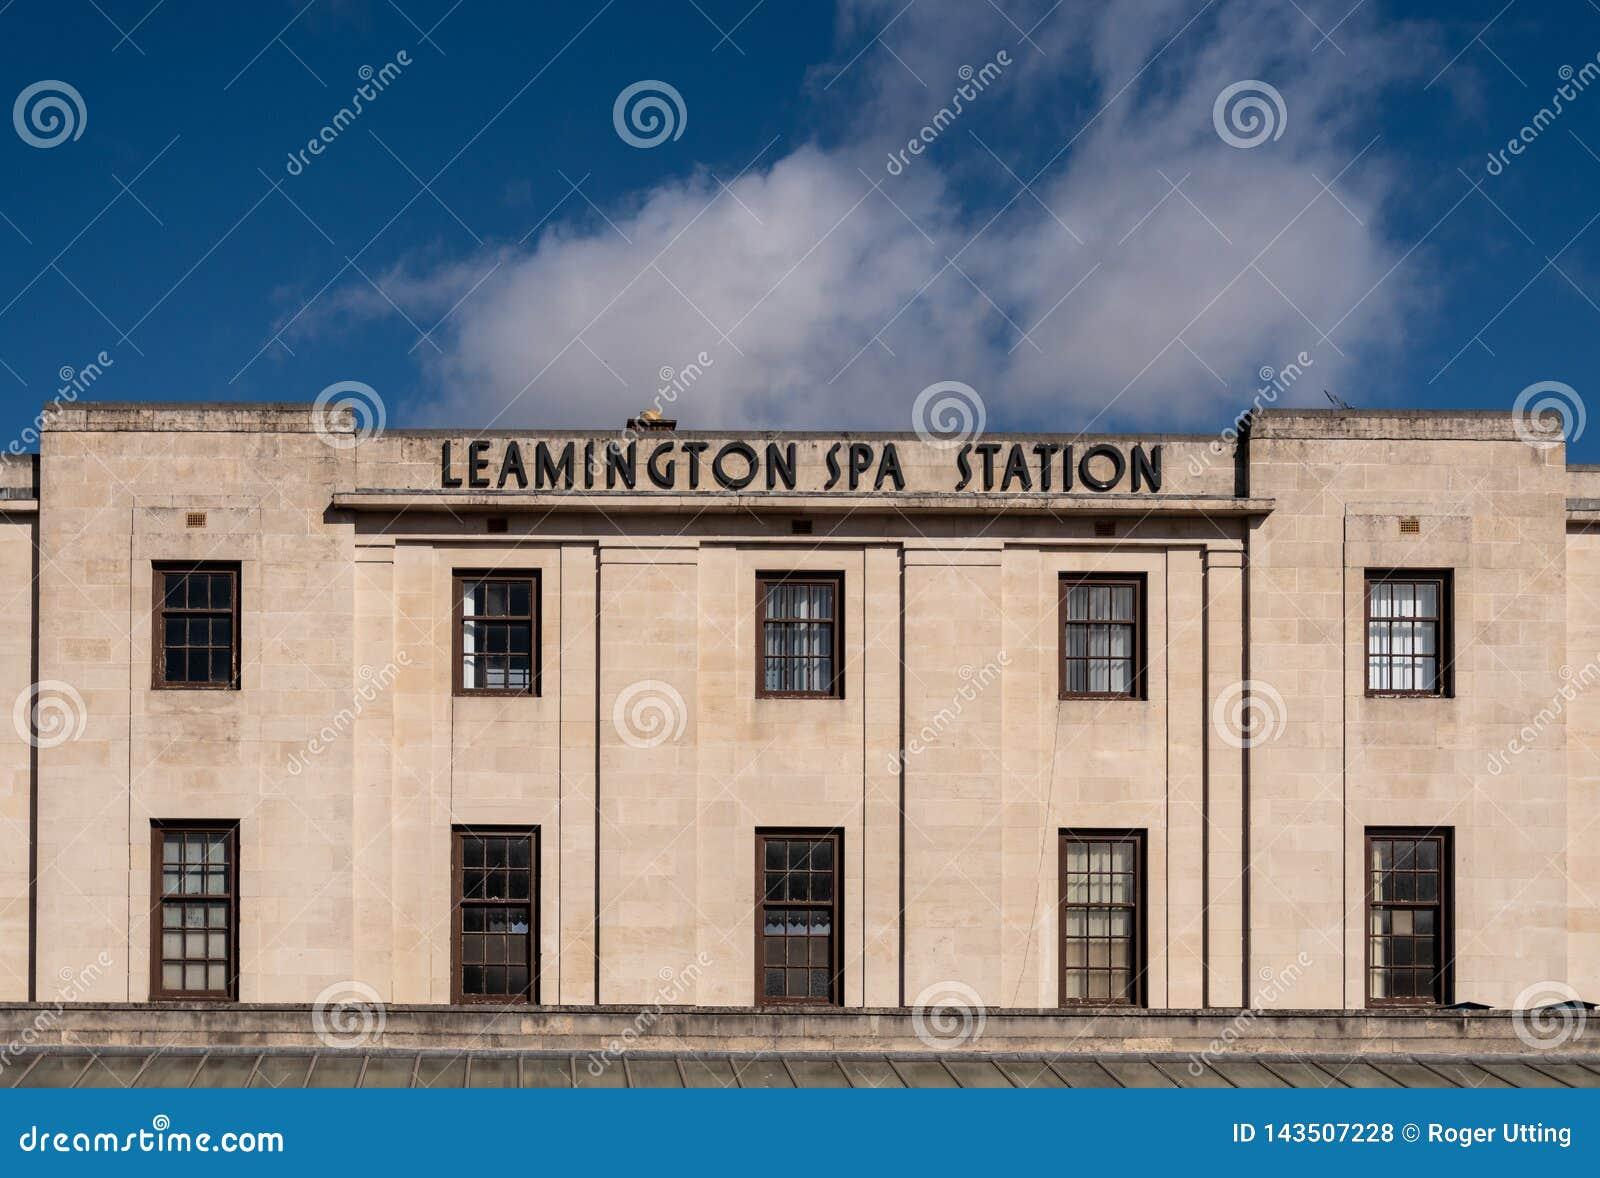 Leamington Spa Station entrance